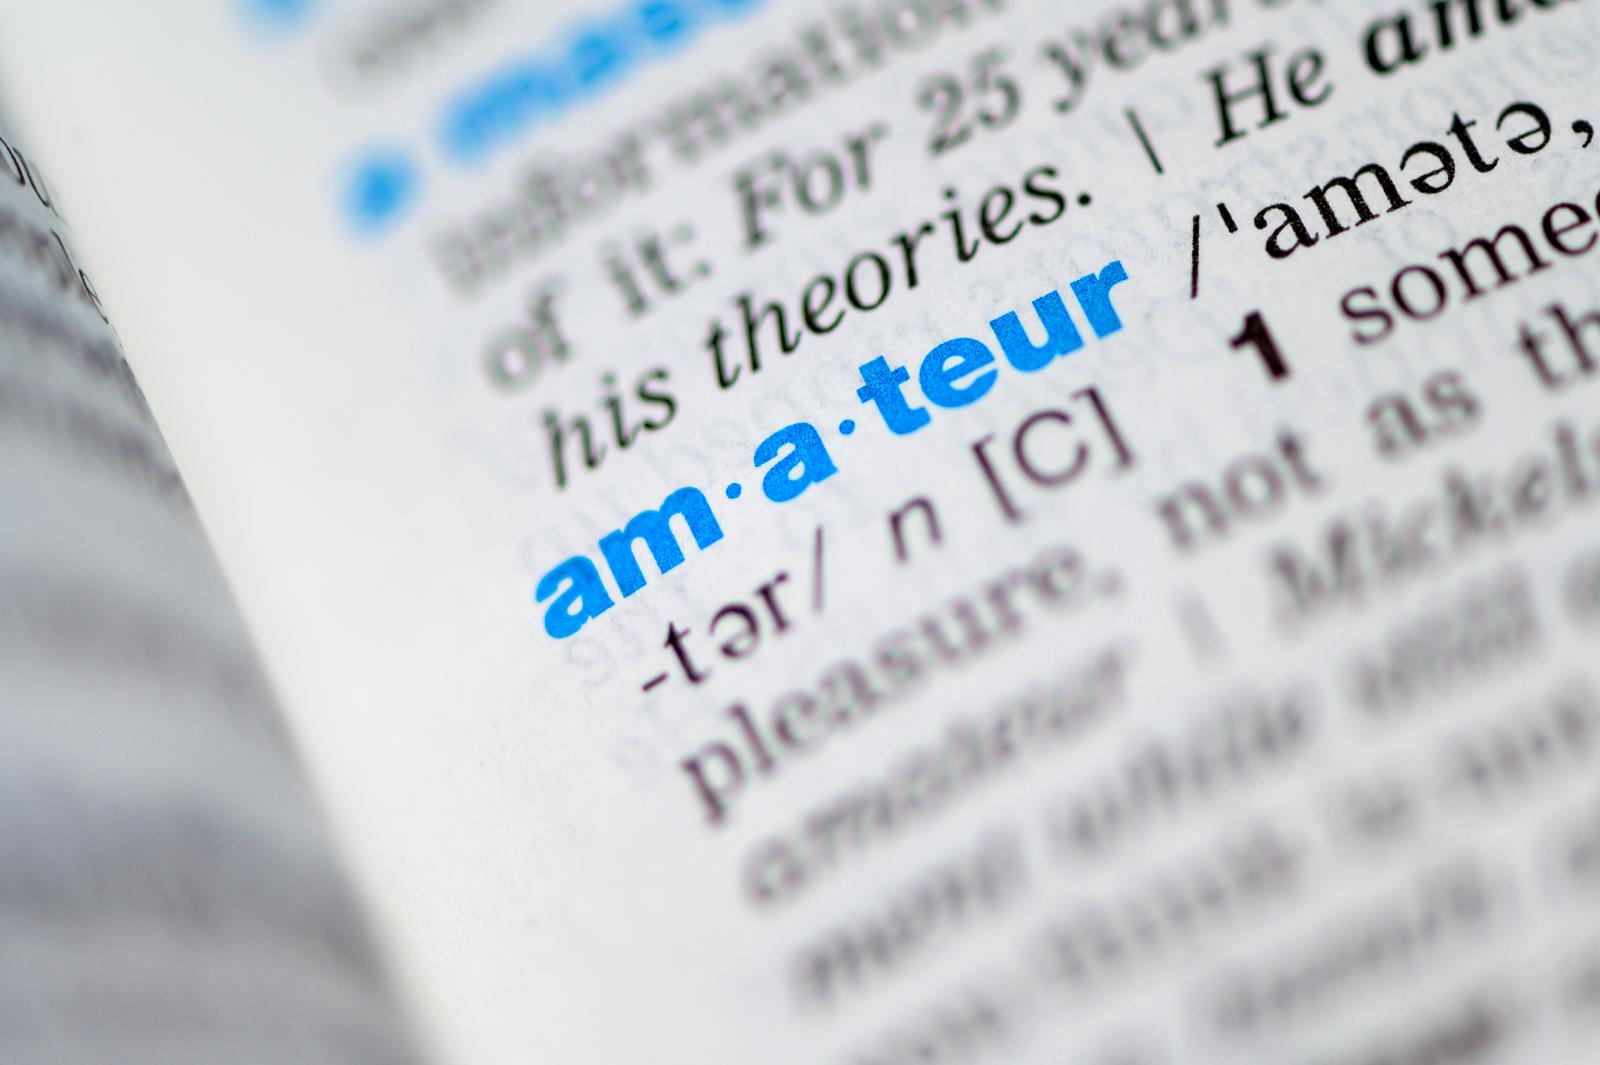 amateur, 辞書の中の写真